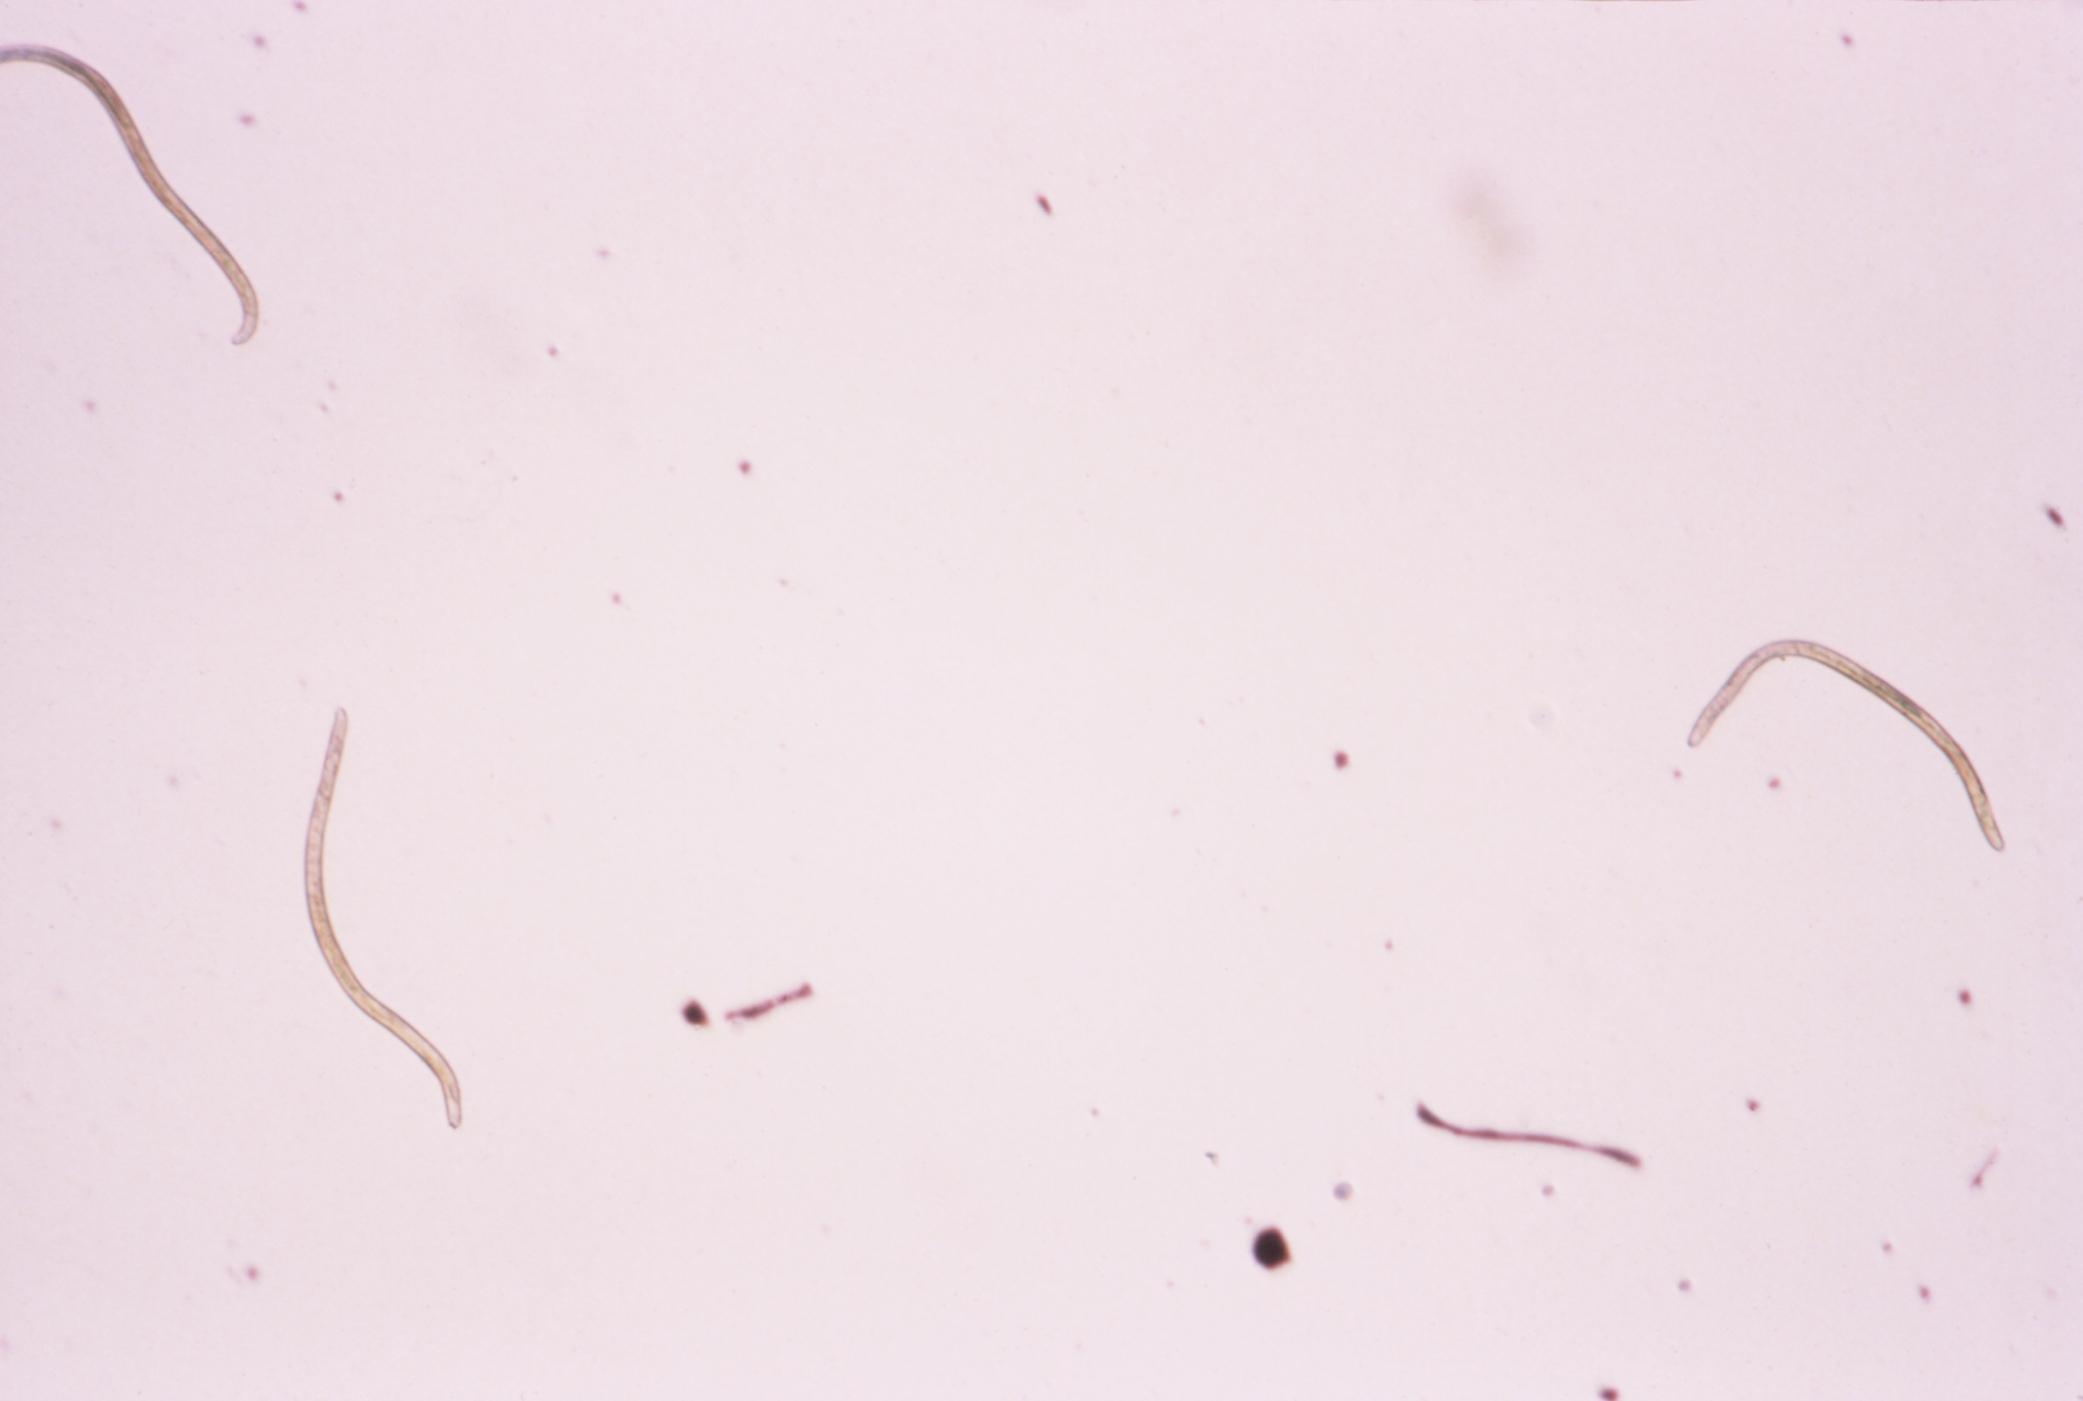 Onchocerca volvulus  atlas